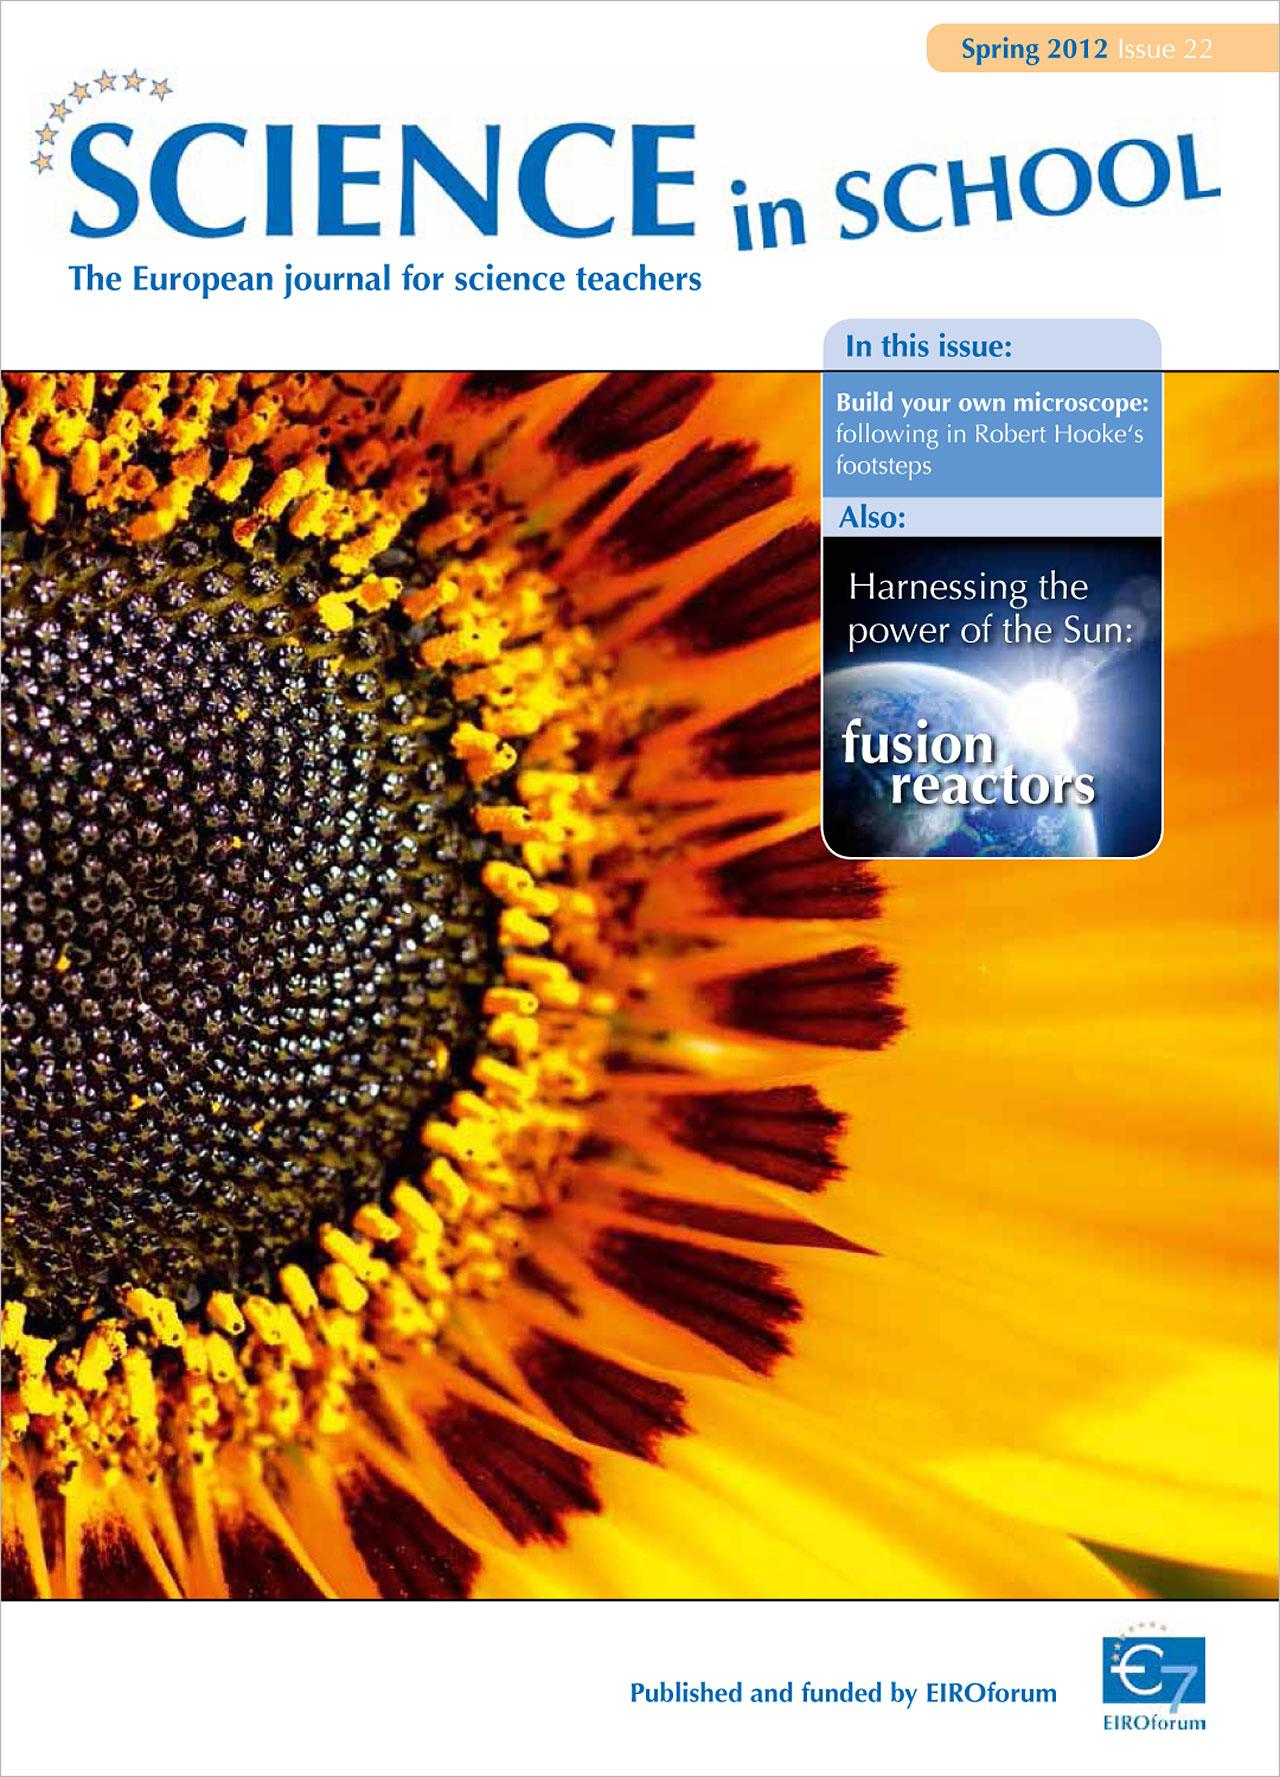 Science in School - Ausgabe 22 (Frühling 2012)